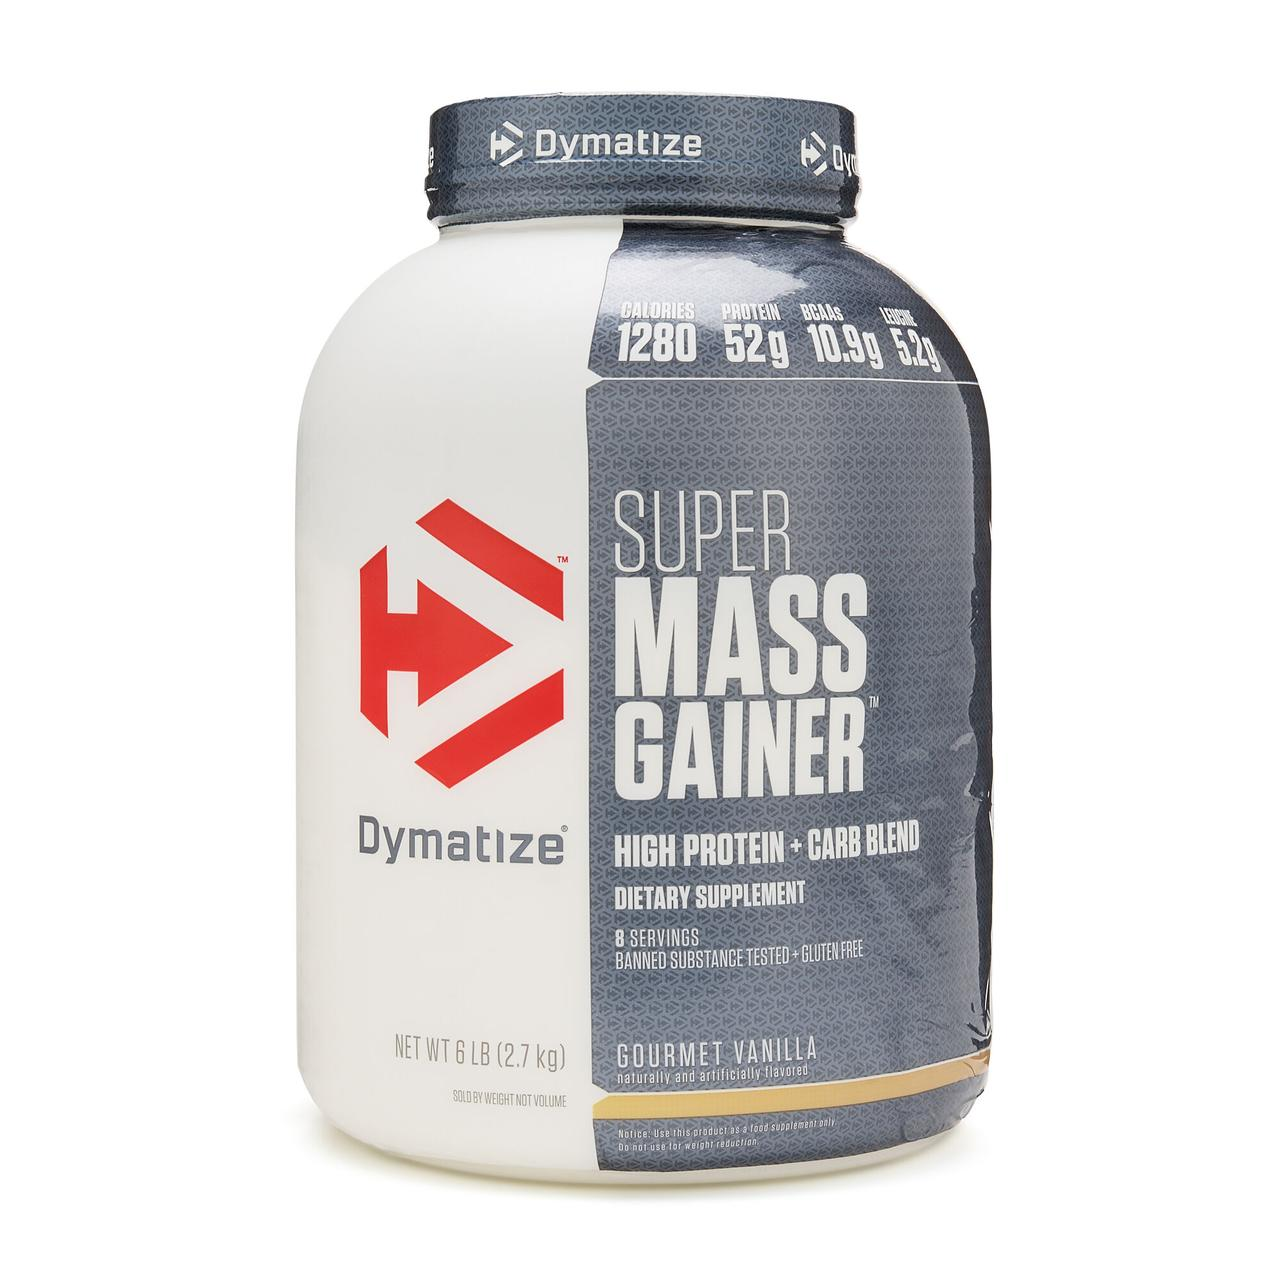 Гейнер Super Mass Gainer Dymatize 2.7 кг США